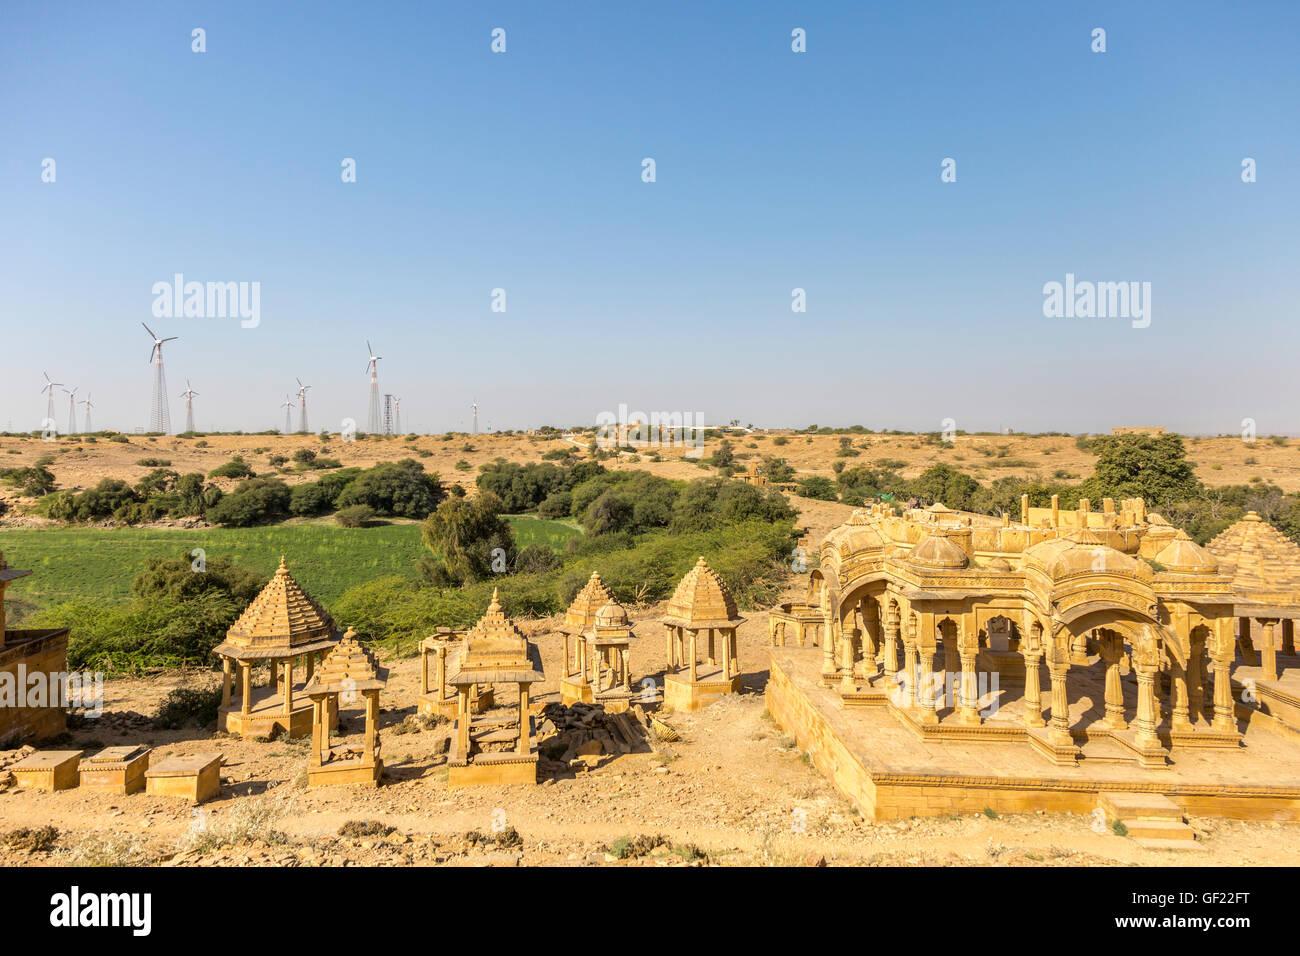 Bada Bagh Cenotaphs, Jaisalmer, Rajasthan, India - Stock Image